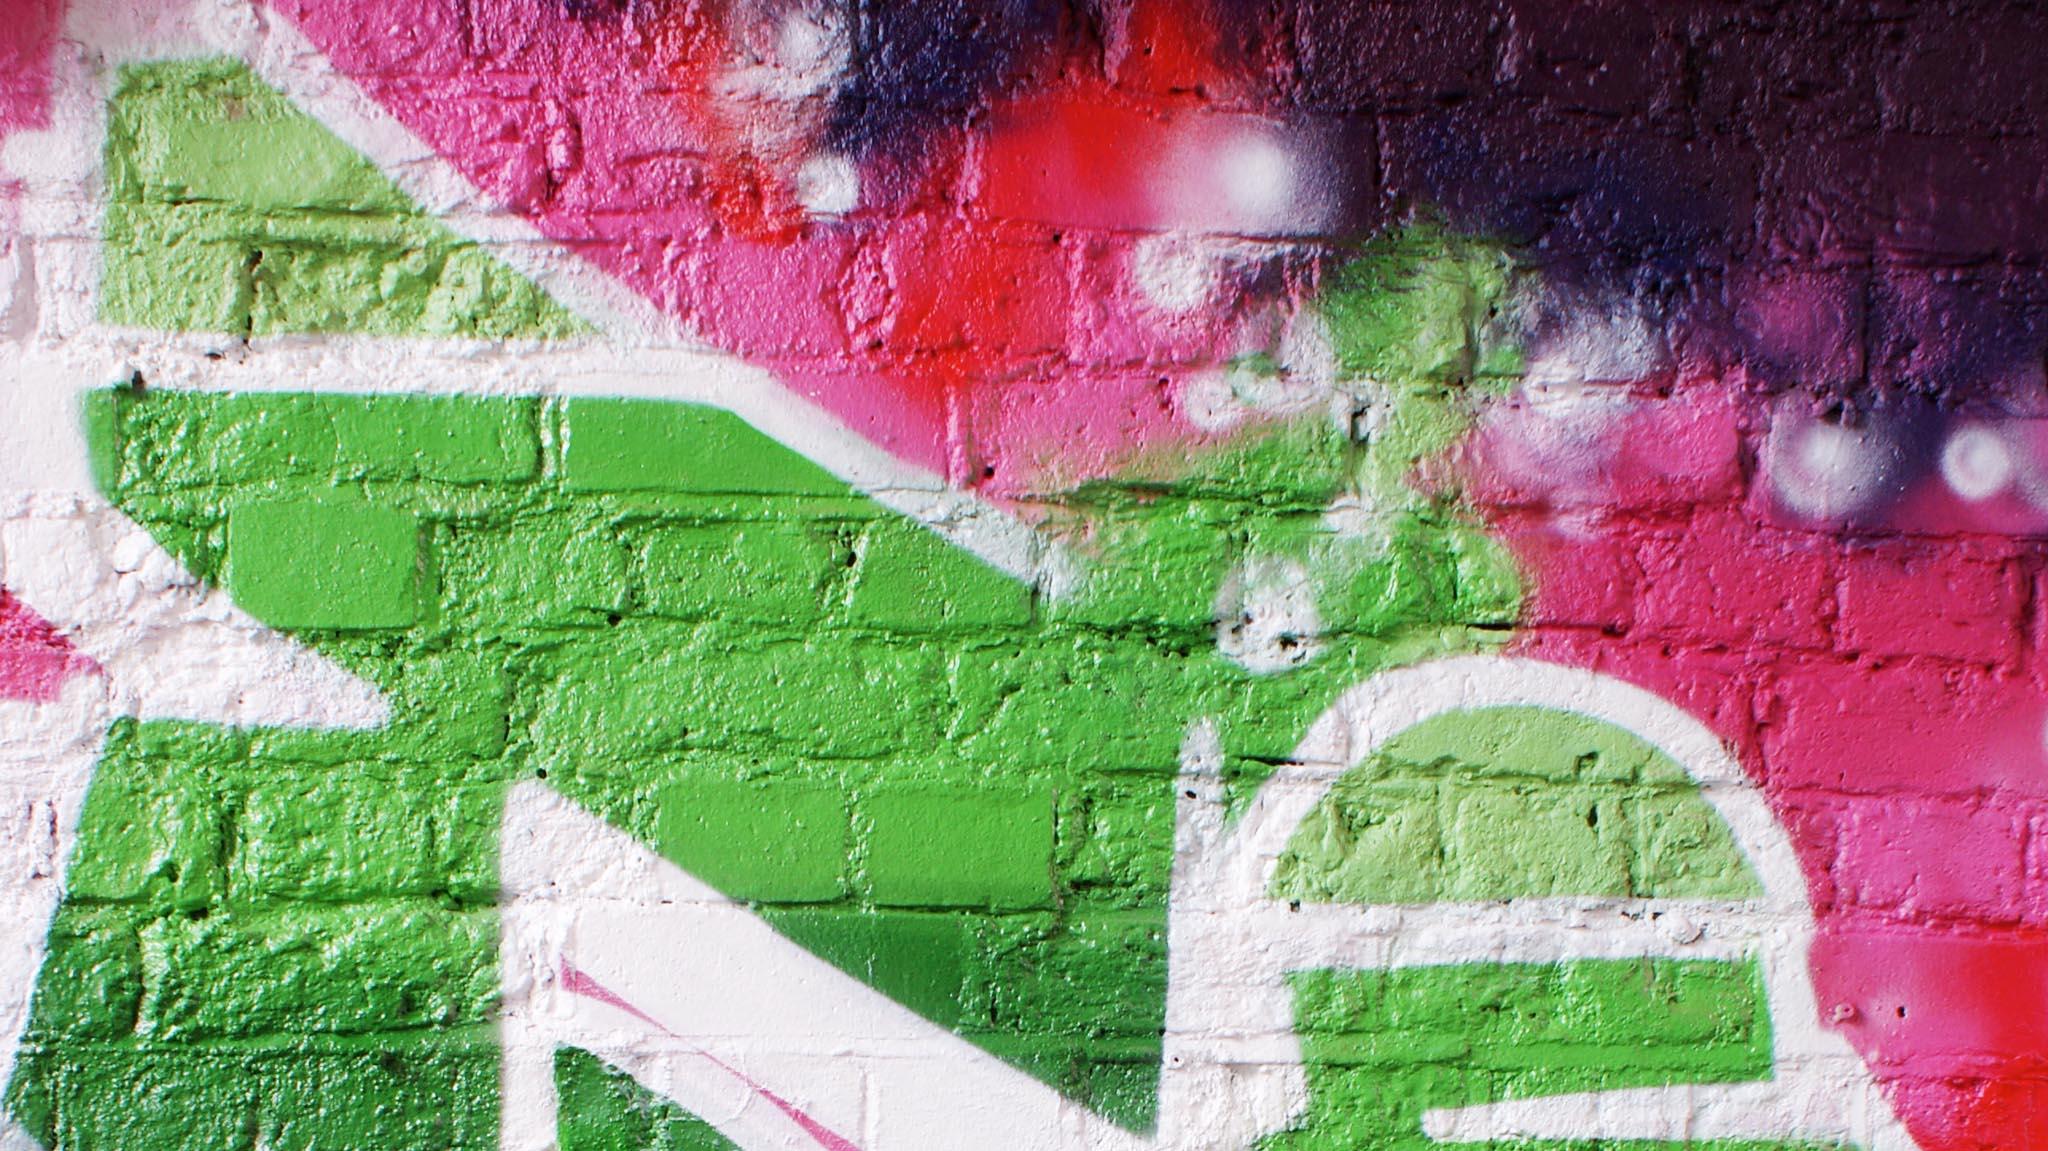 graffiti-onek-krek-manchester